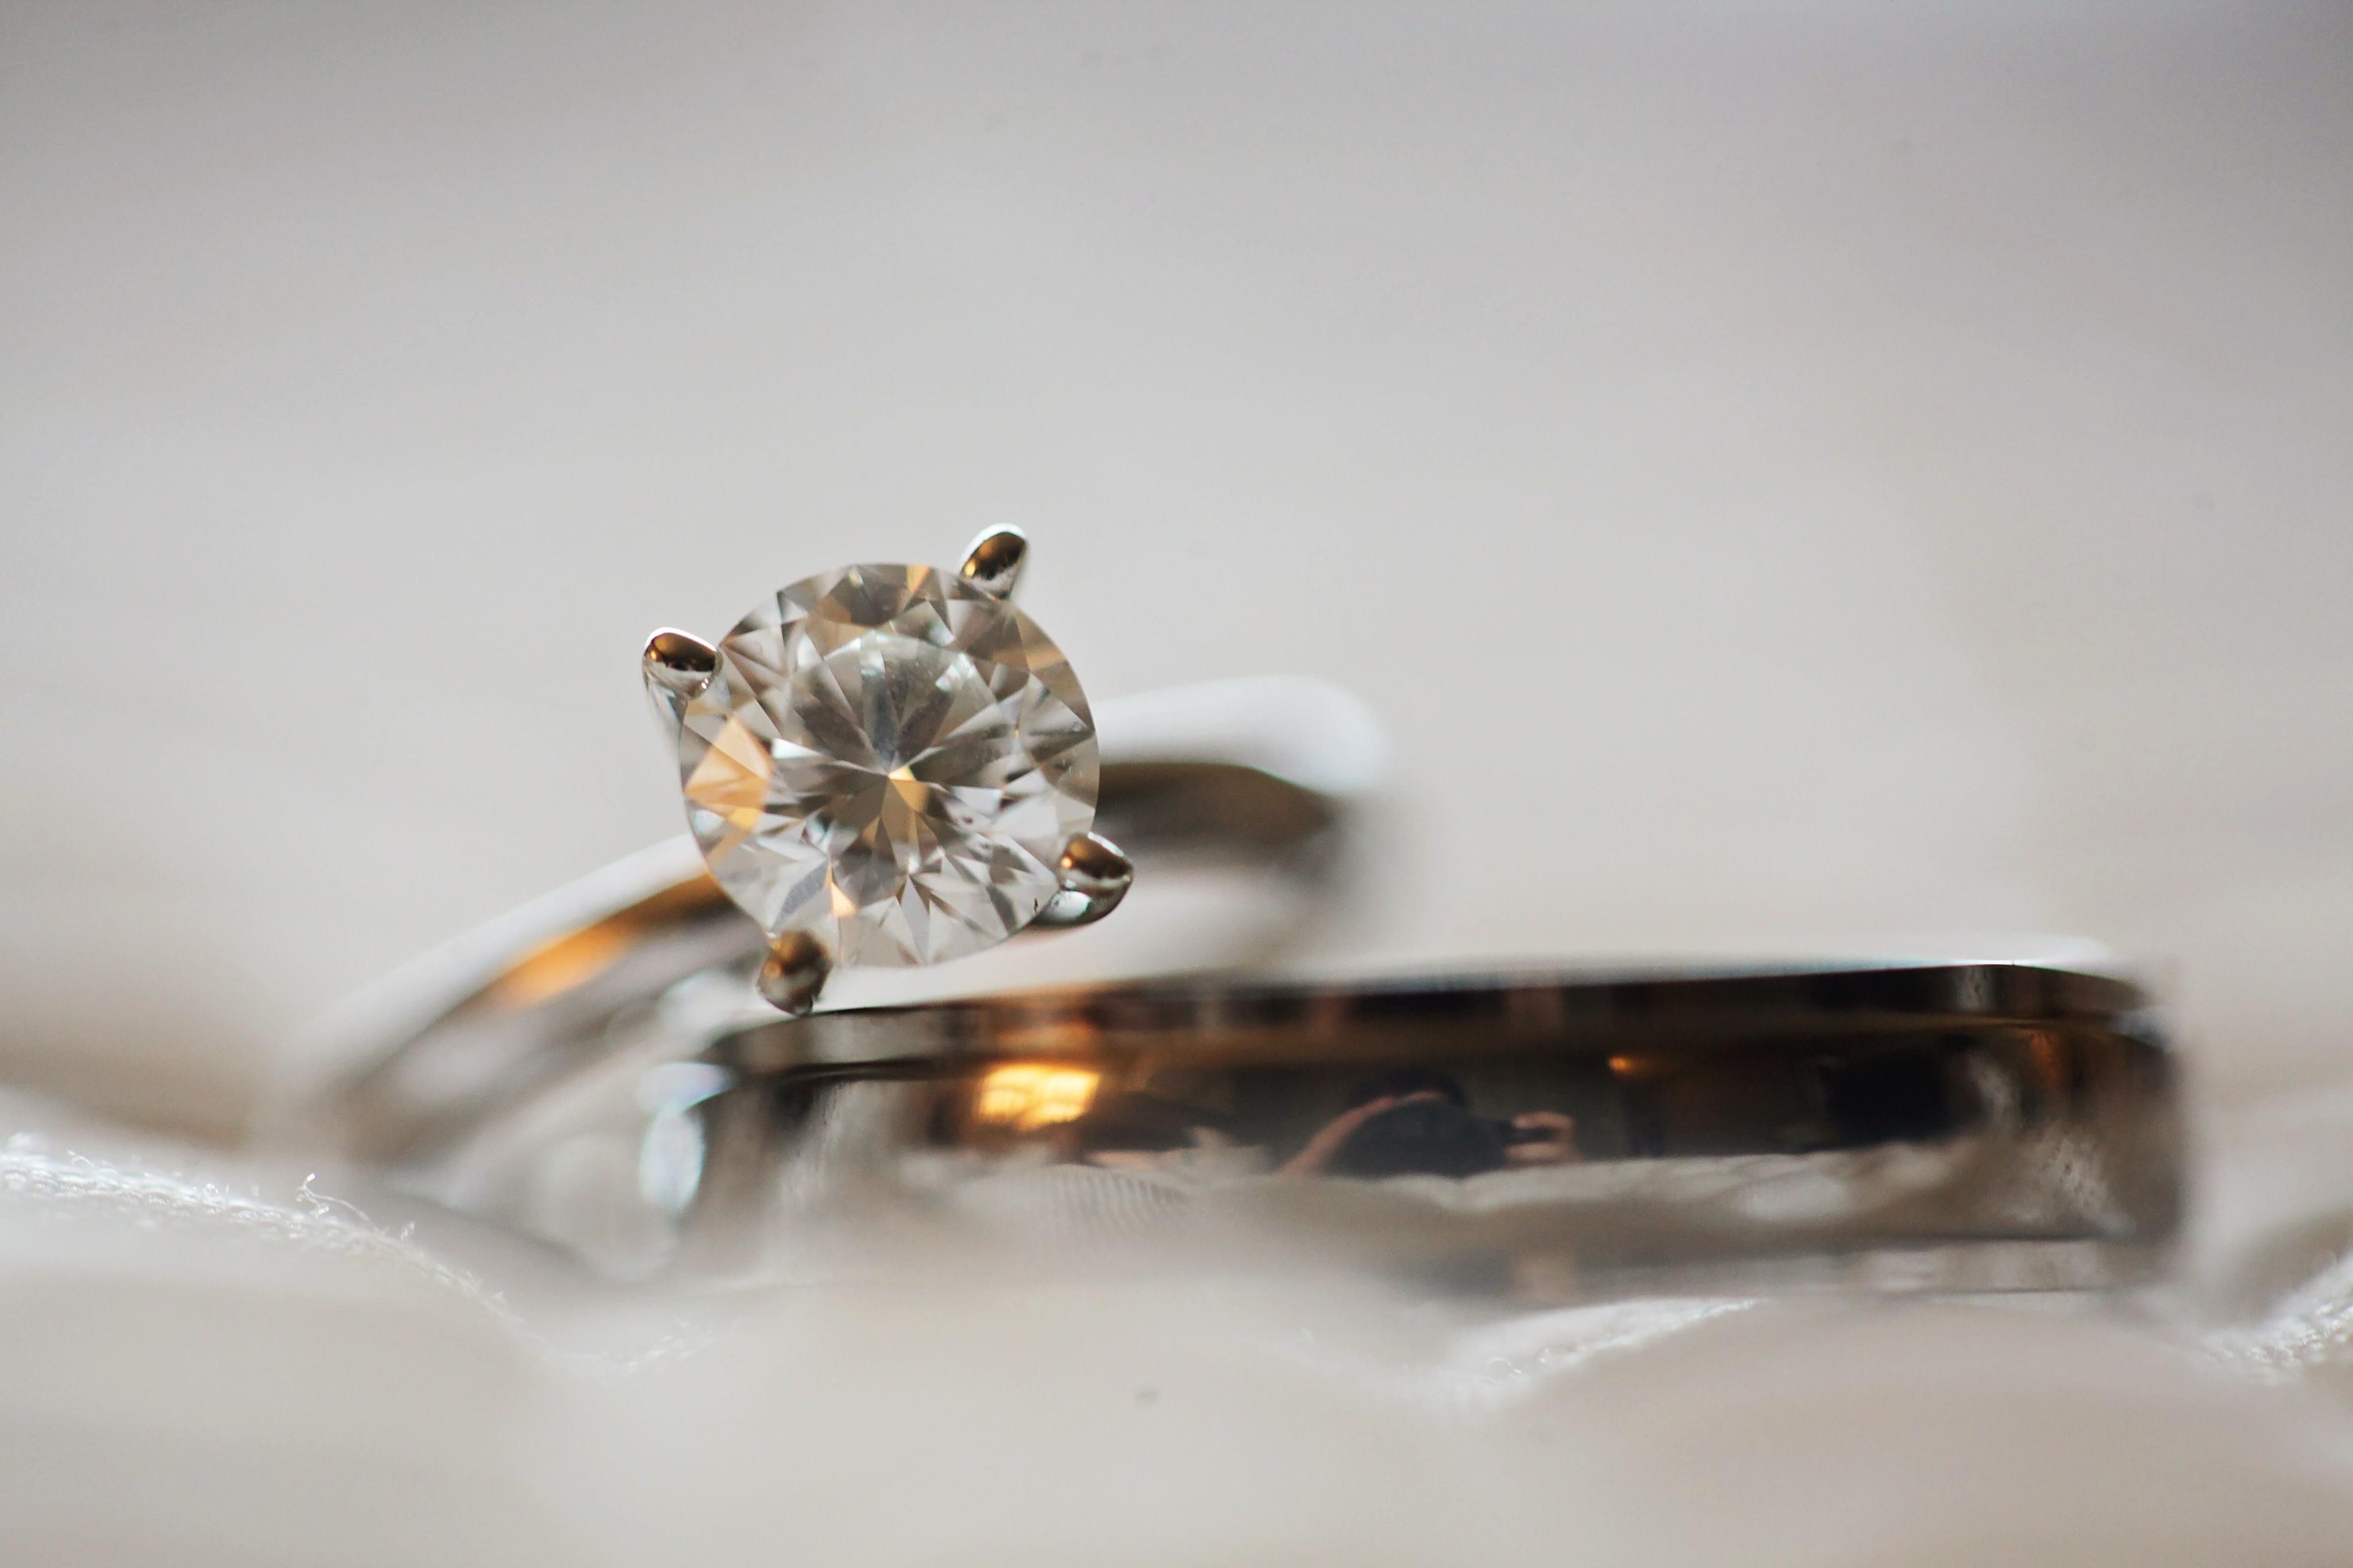 Single birthstone ring